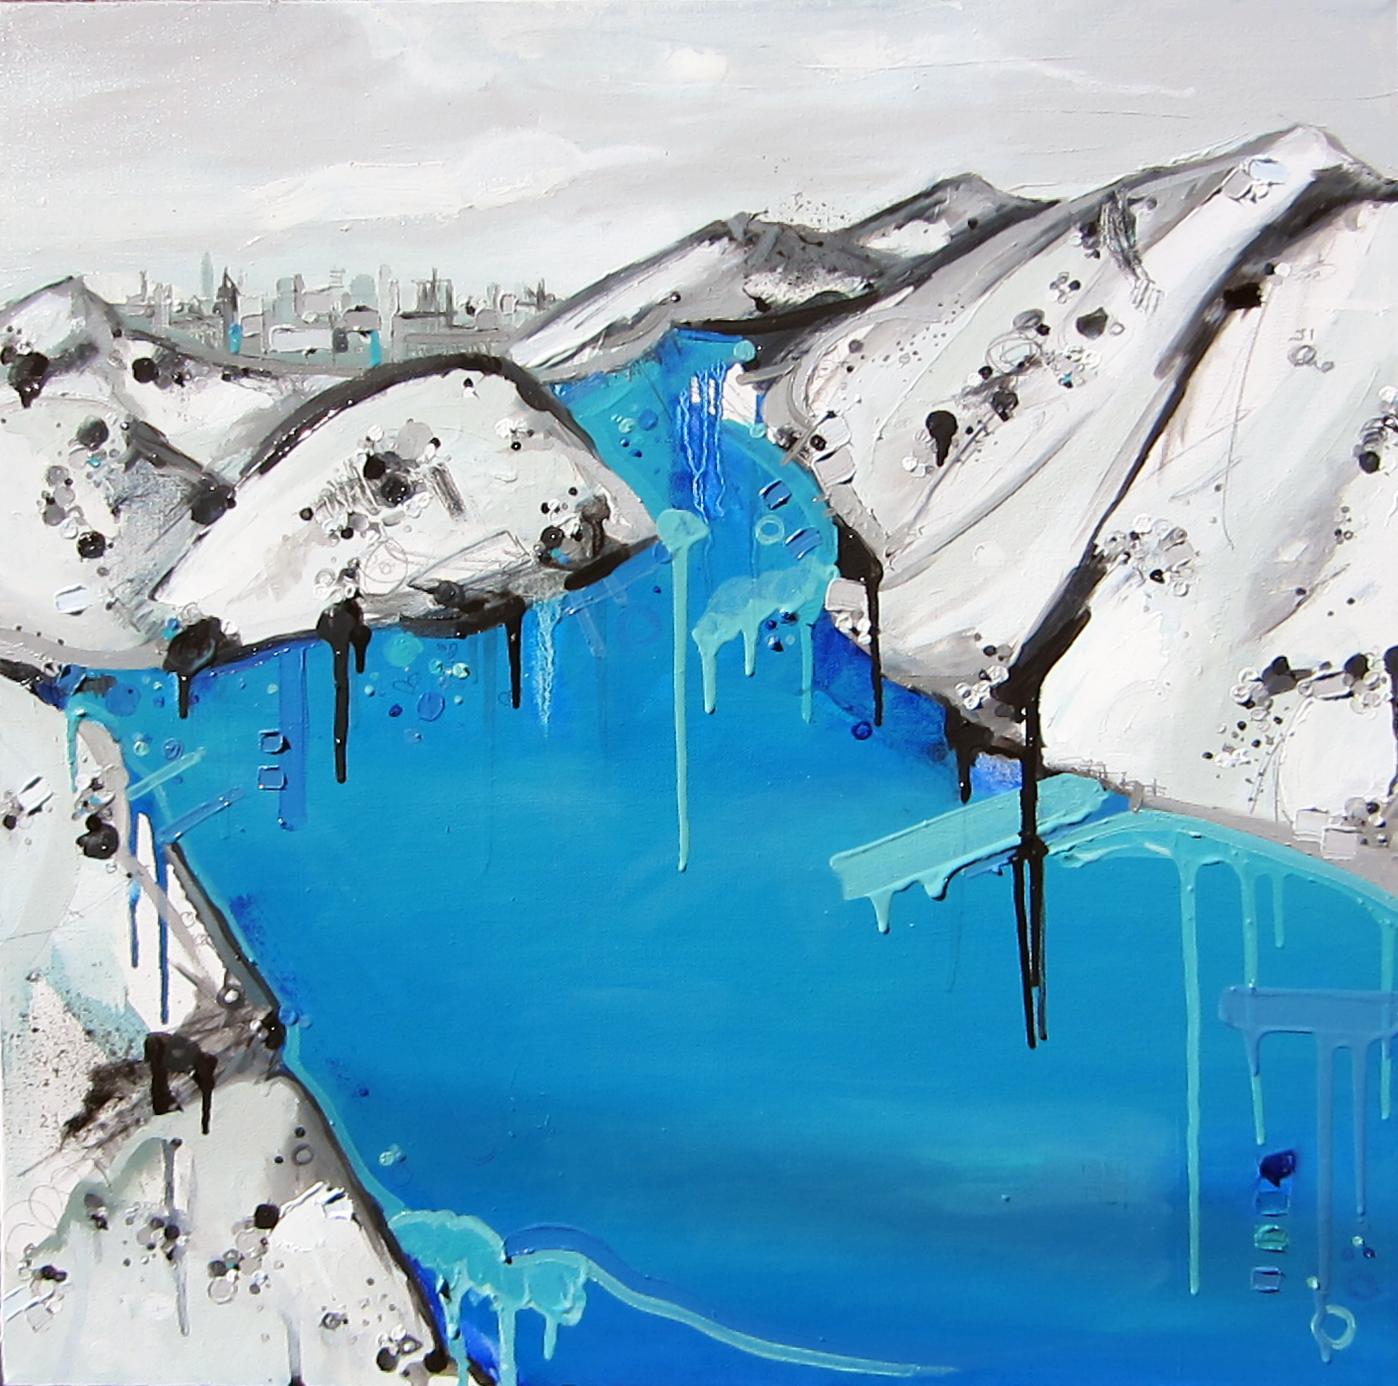 "Grindavik, 2013, Oil on canvas, 24 x 24"""